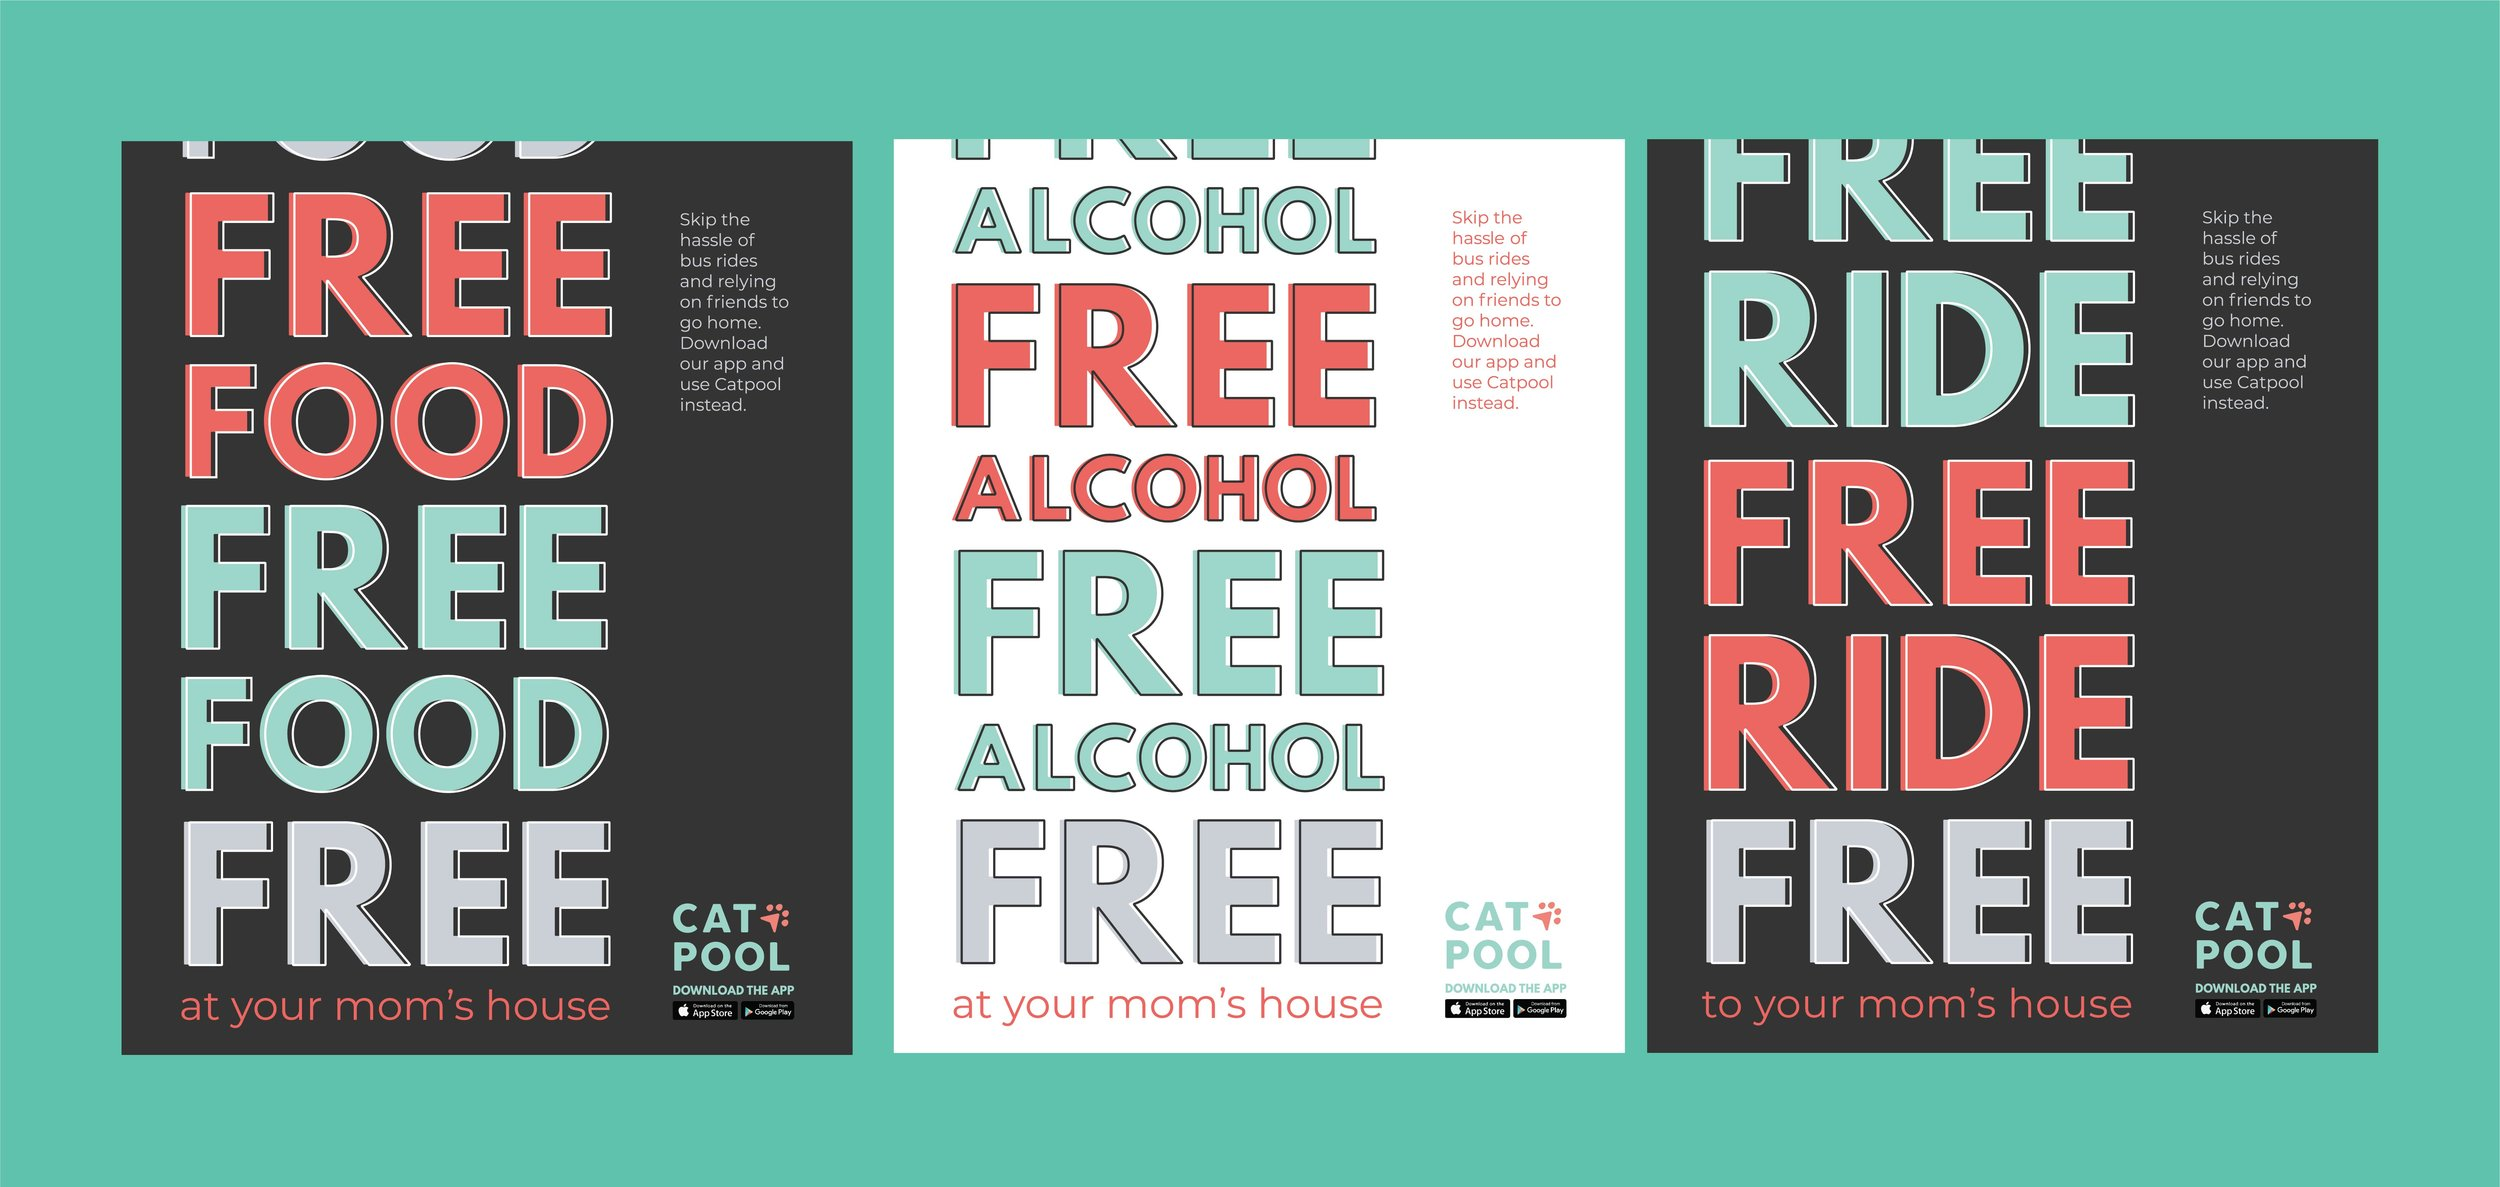 catpool posters-02.jpg